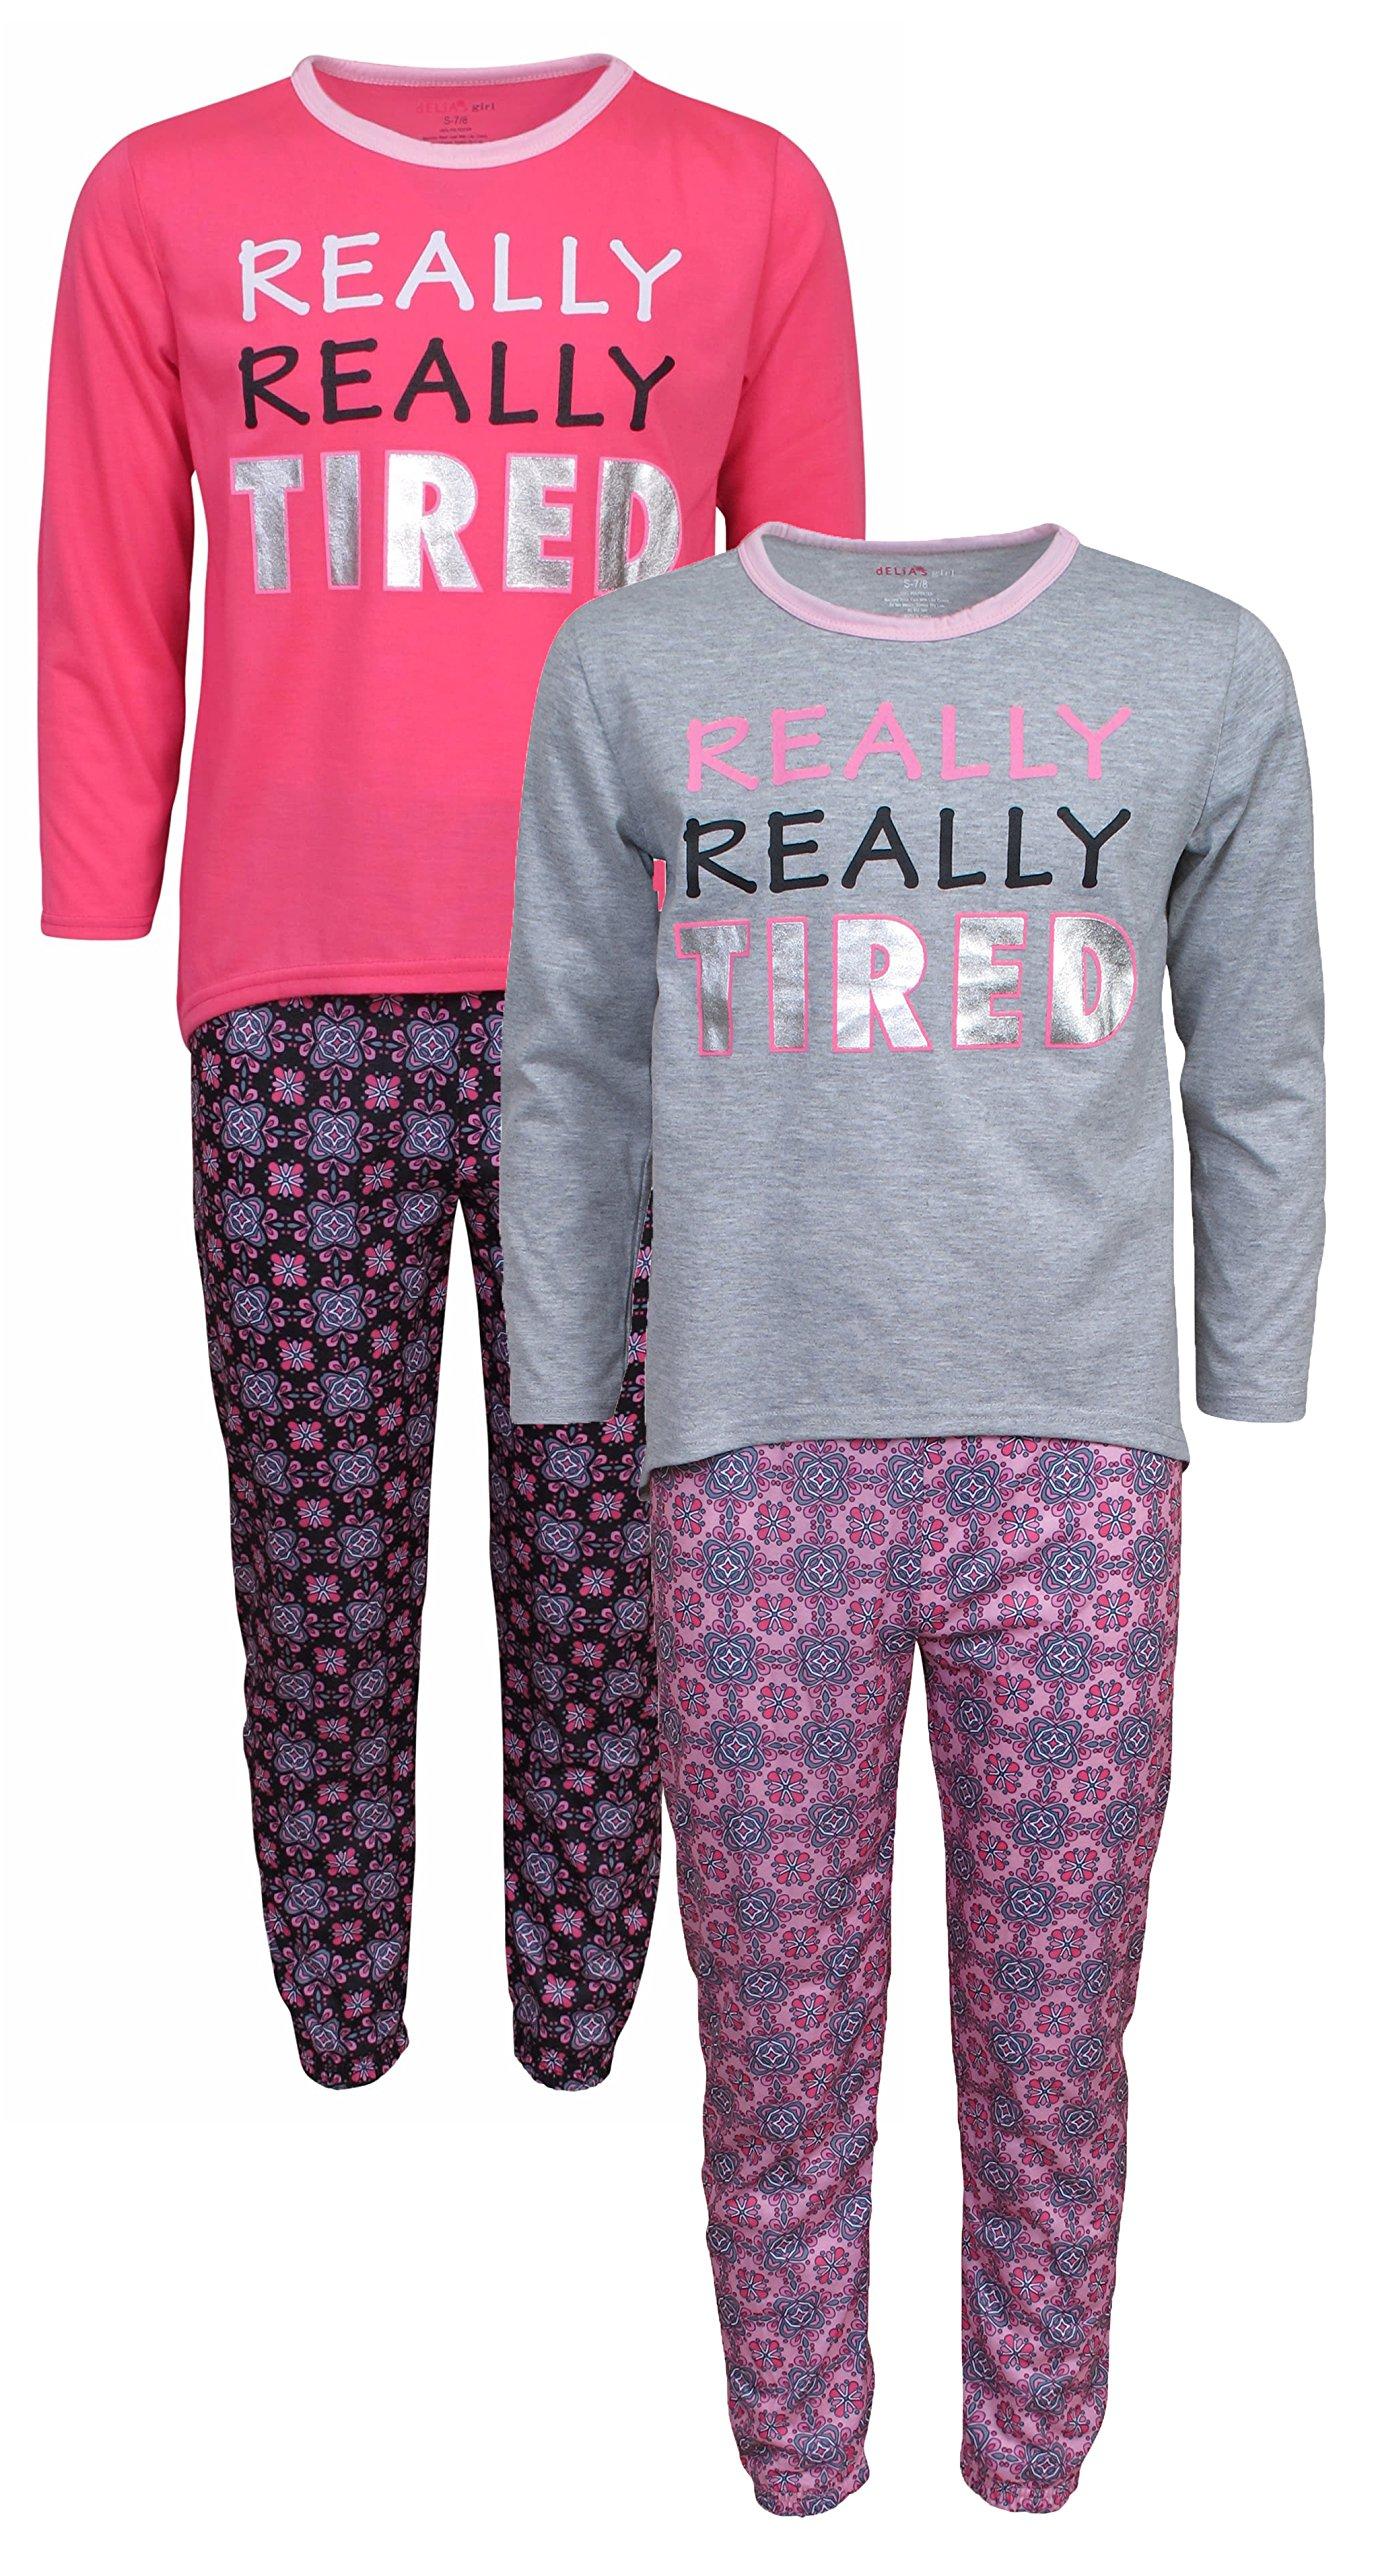 dELiA*s Girls Pajama Sleepwear Sets Long Sleeve Shirts With Pants, Tired, Size 10/12 (2 Full Sets)'